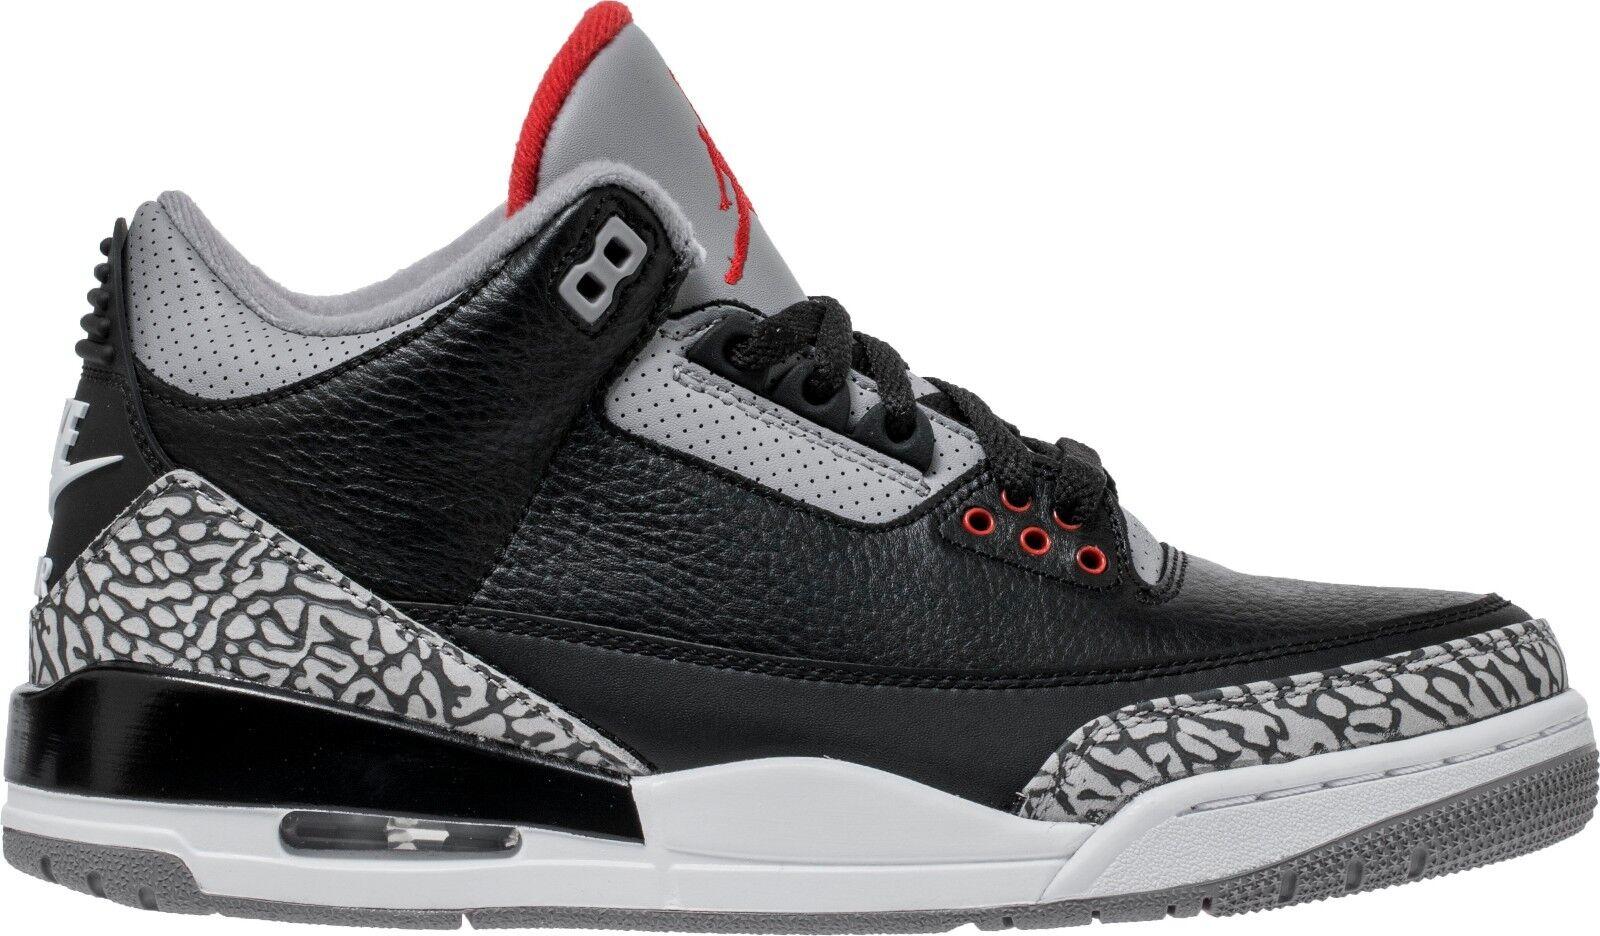 Nike Air Jordan 3 Black Cement Retro III OG 854262 001 Great discount